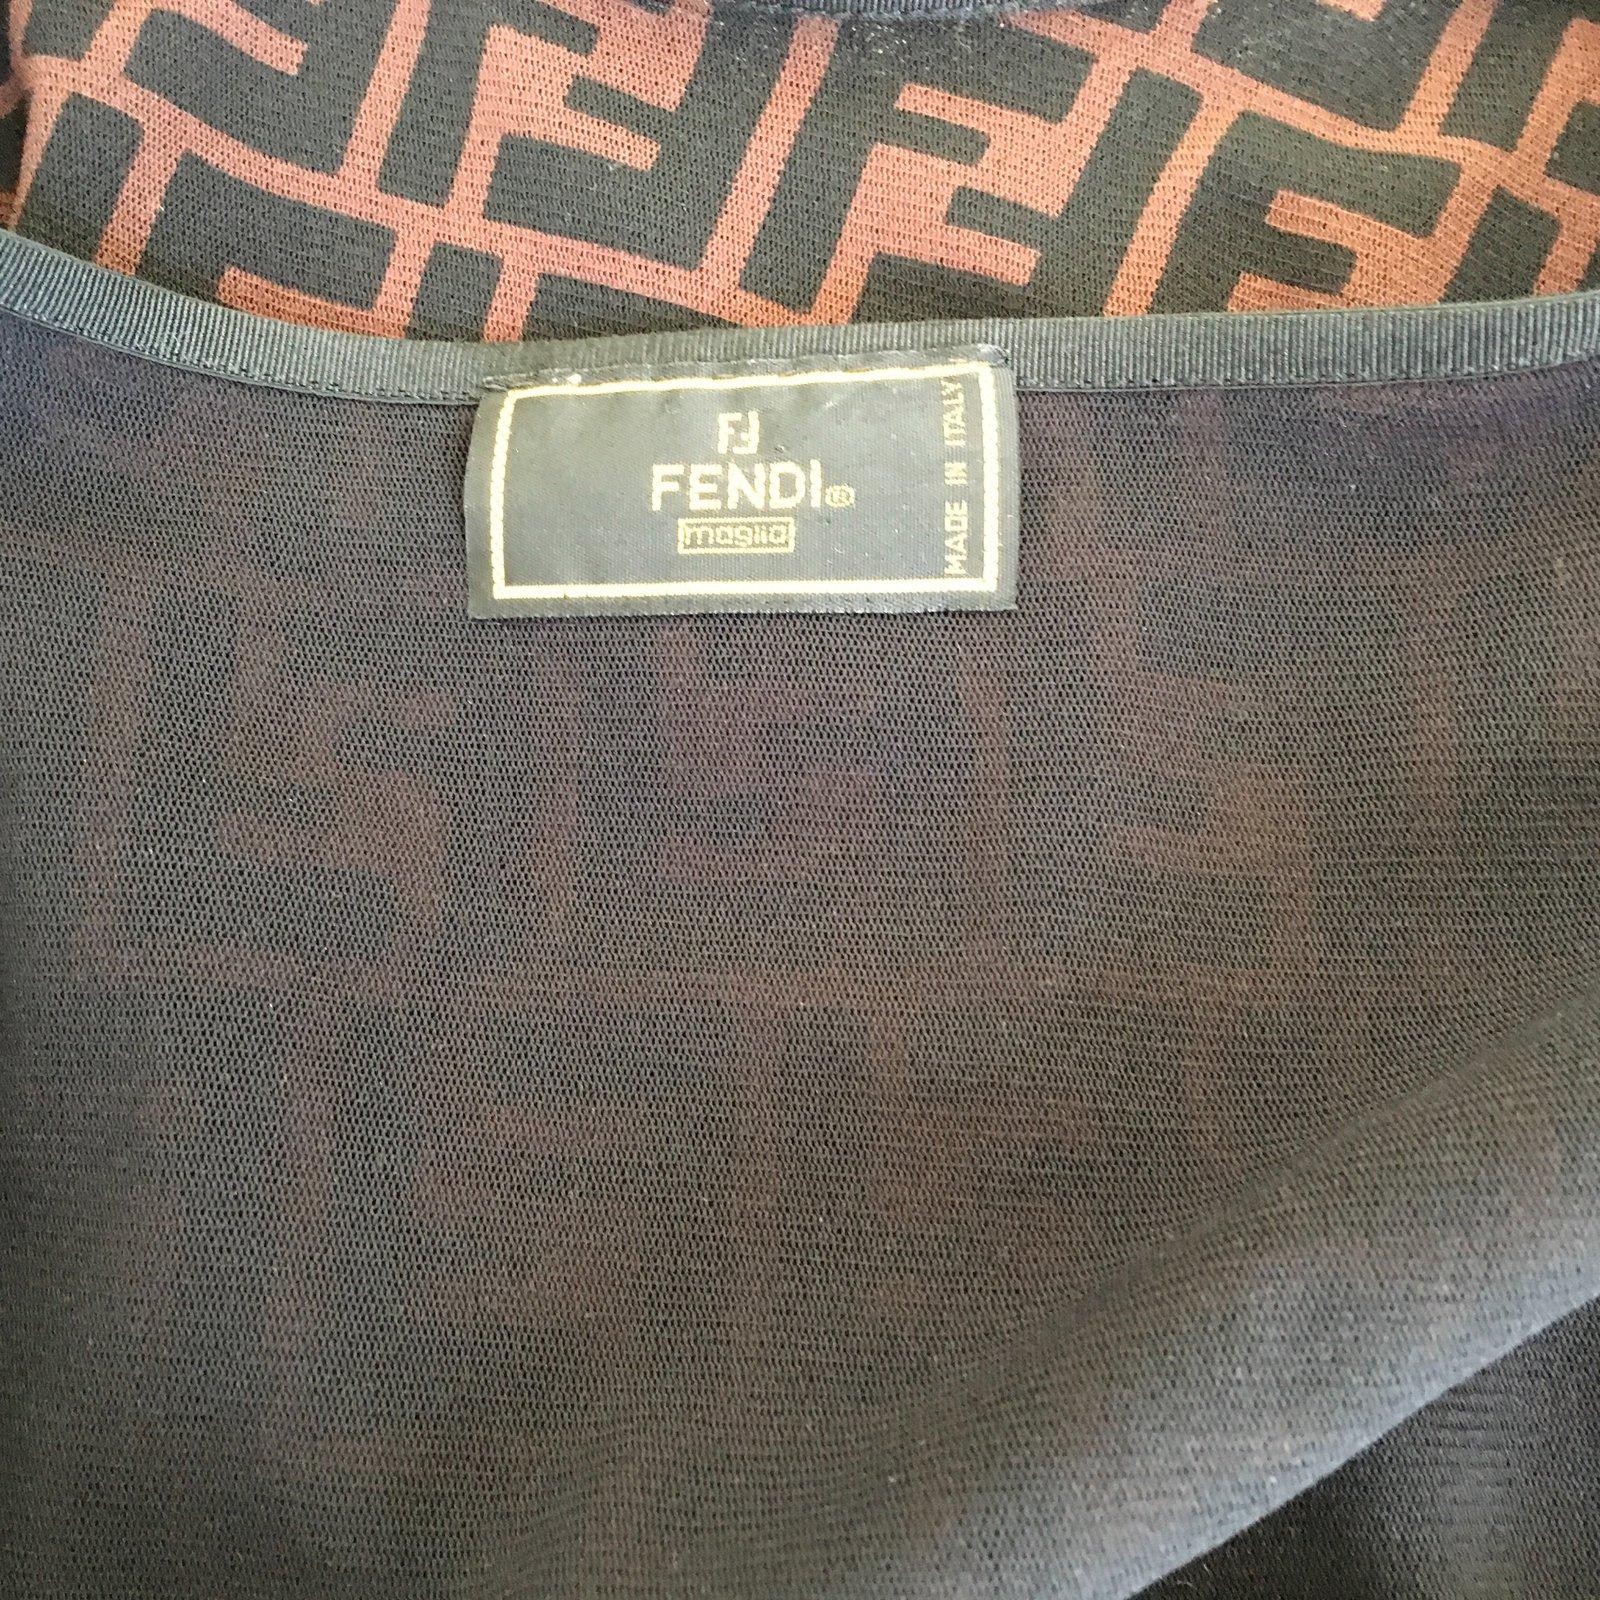 Fendi Closet Joli Ref 29260 Polyamide Marron Tops Monogramme wkTlXOZiuP